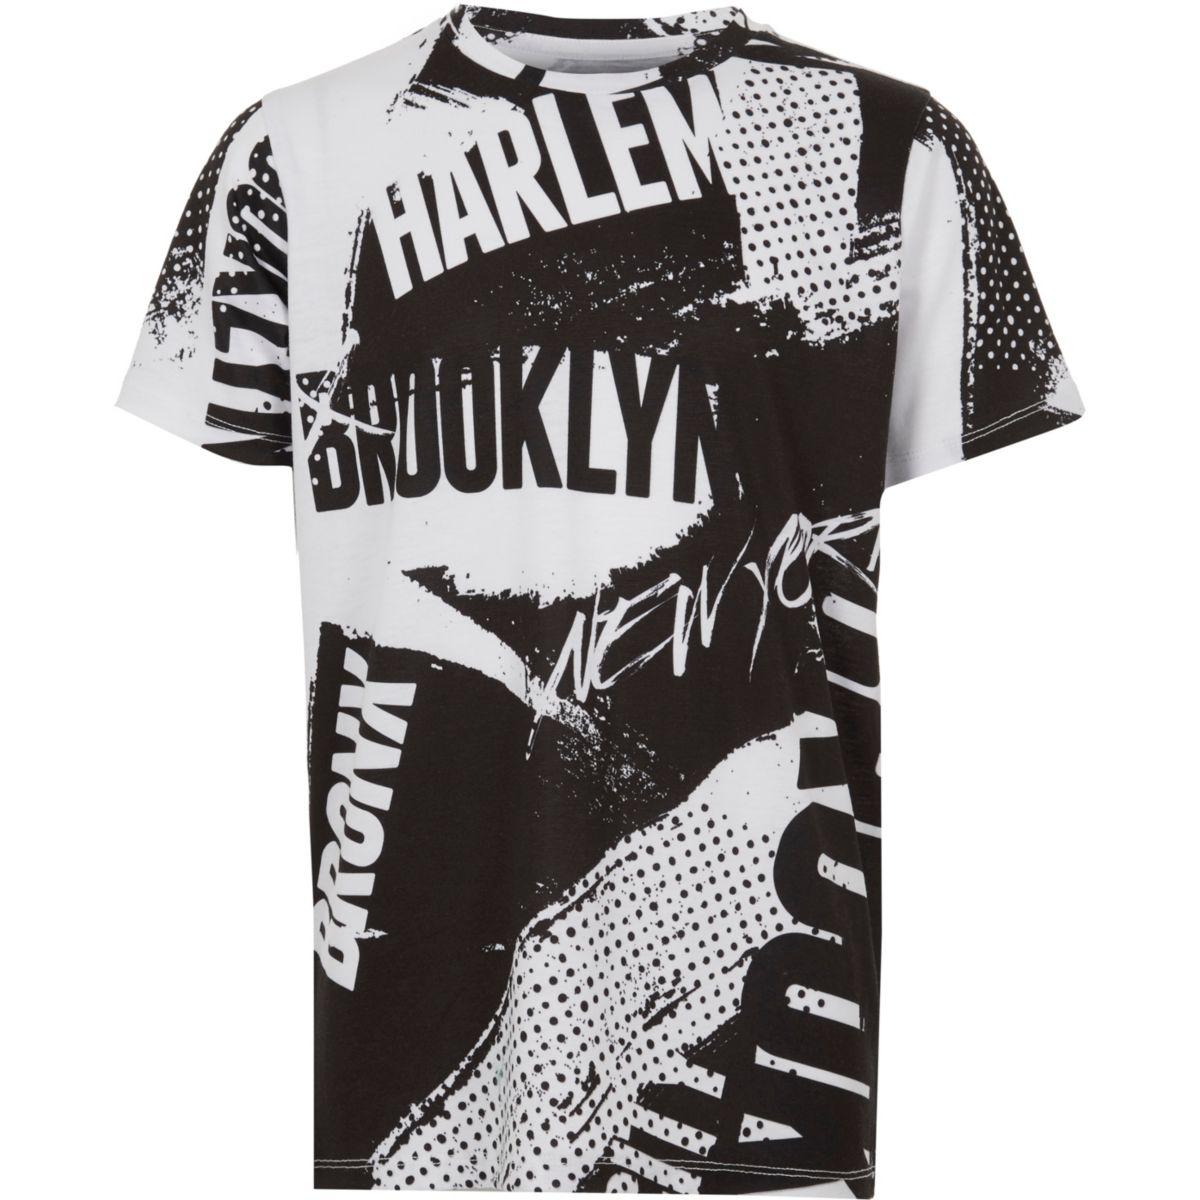 Boys black 'Bronx' graffiti print T-shirt